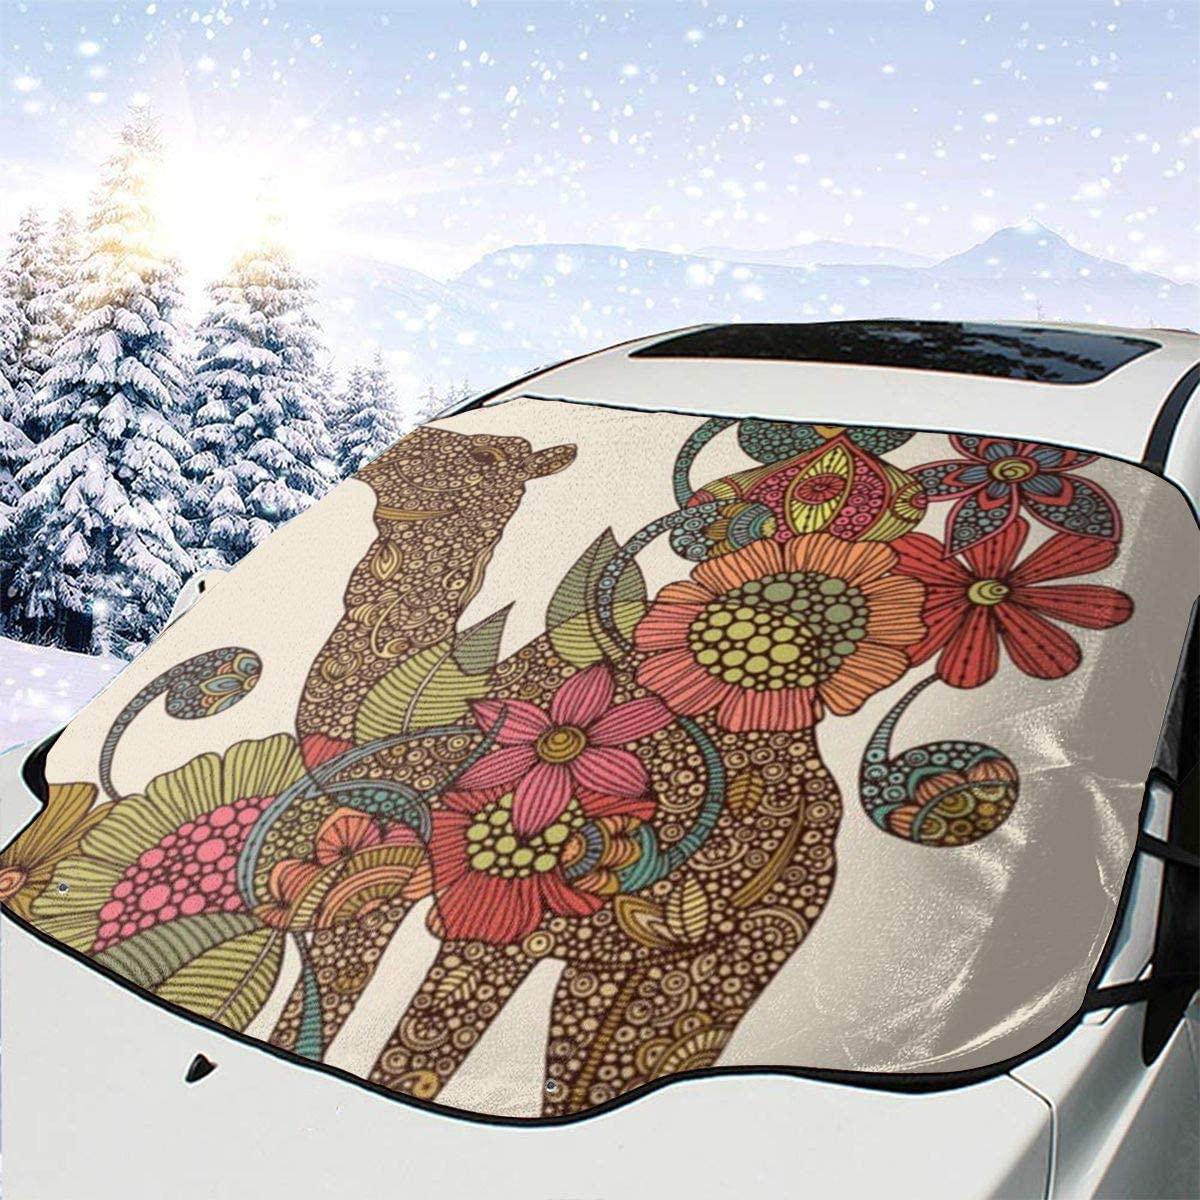 THONFIRE Car Front Window Windshield Ice Sun Shades Easy Camels Cover Rainproof Blocks Heat Damage Free Visor Protector Auto Autumn Heatshield